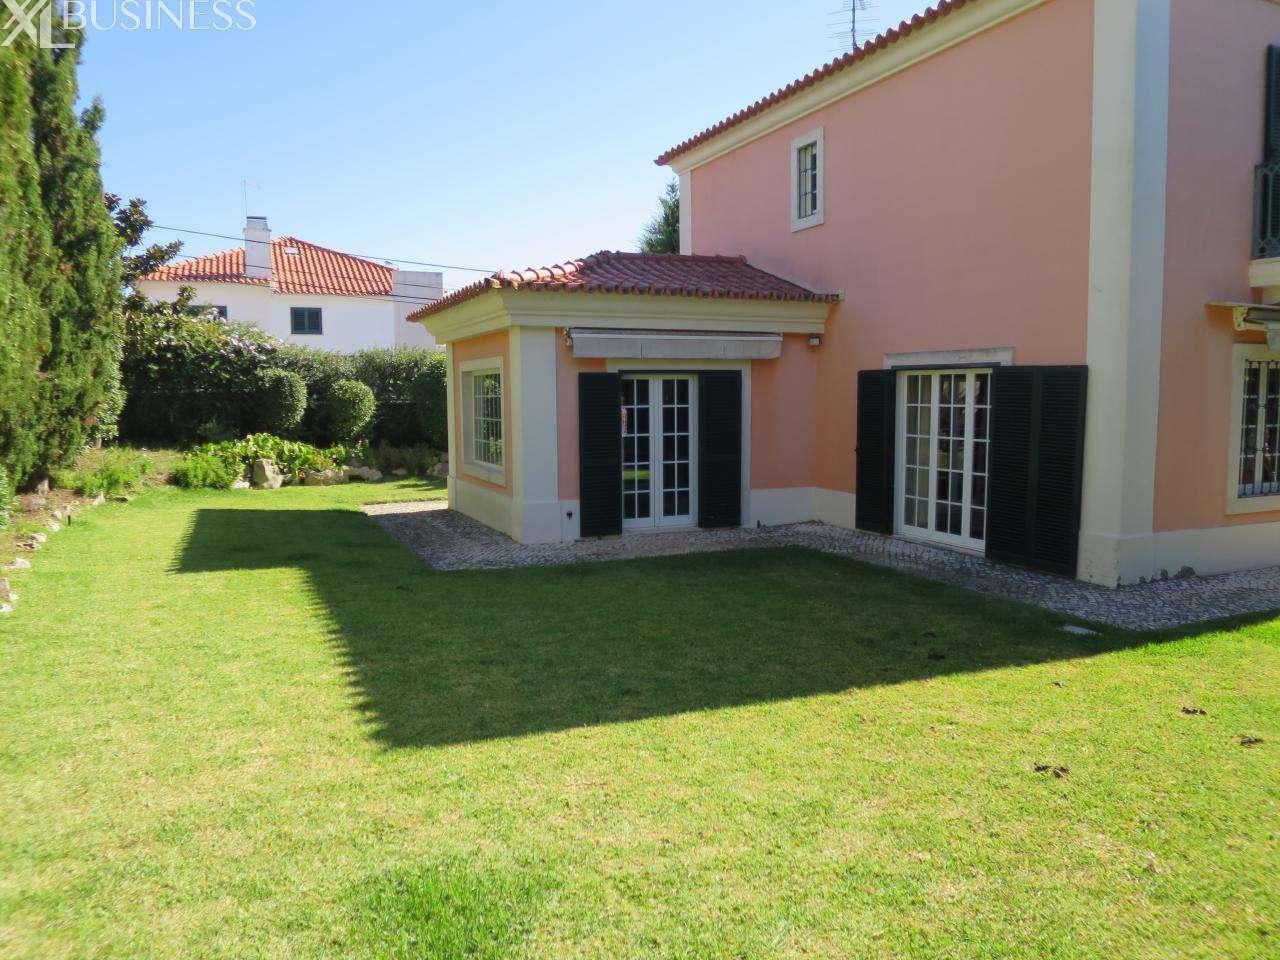 Moradia para arrendar, Alcabideche, Cascais, Lisboa - Foto 1